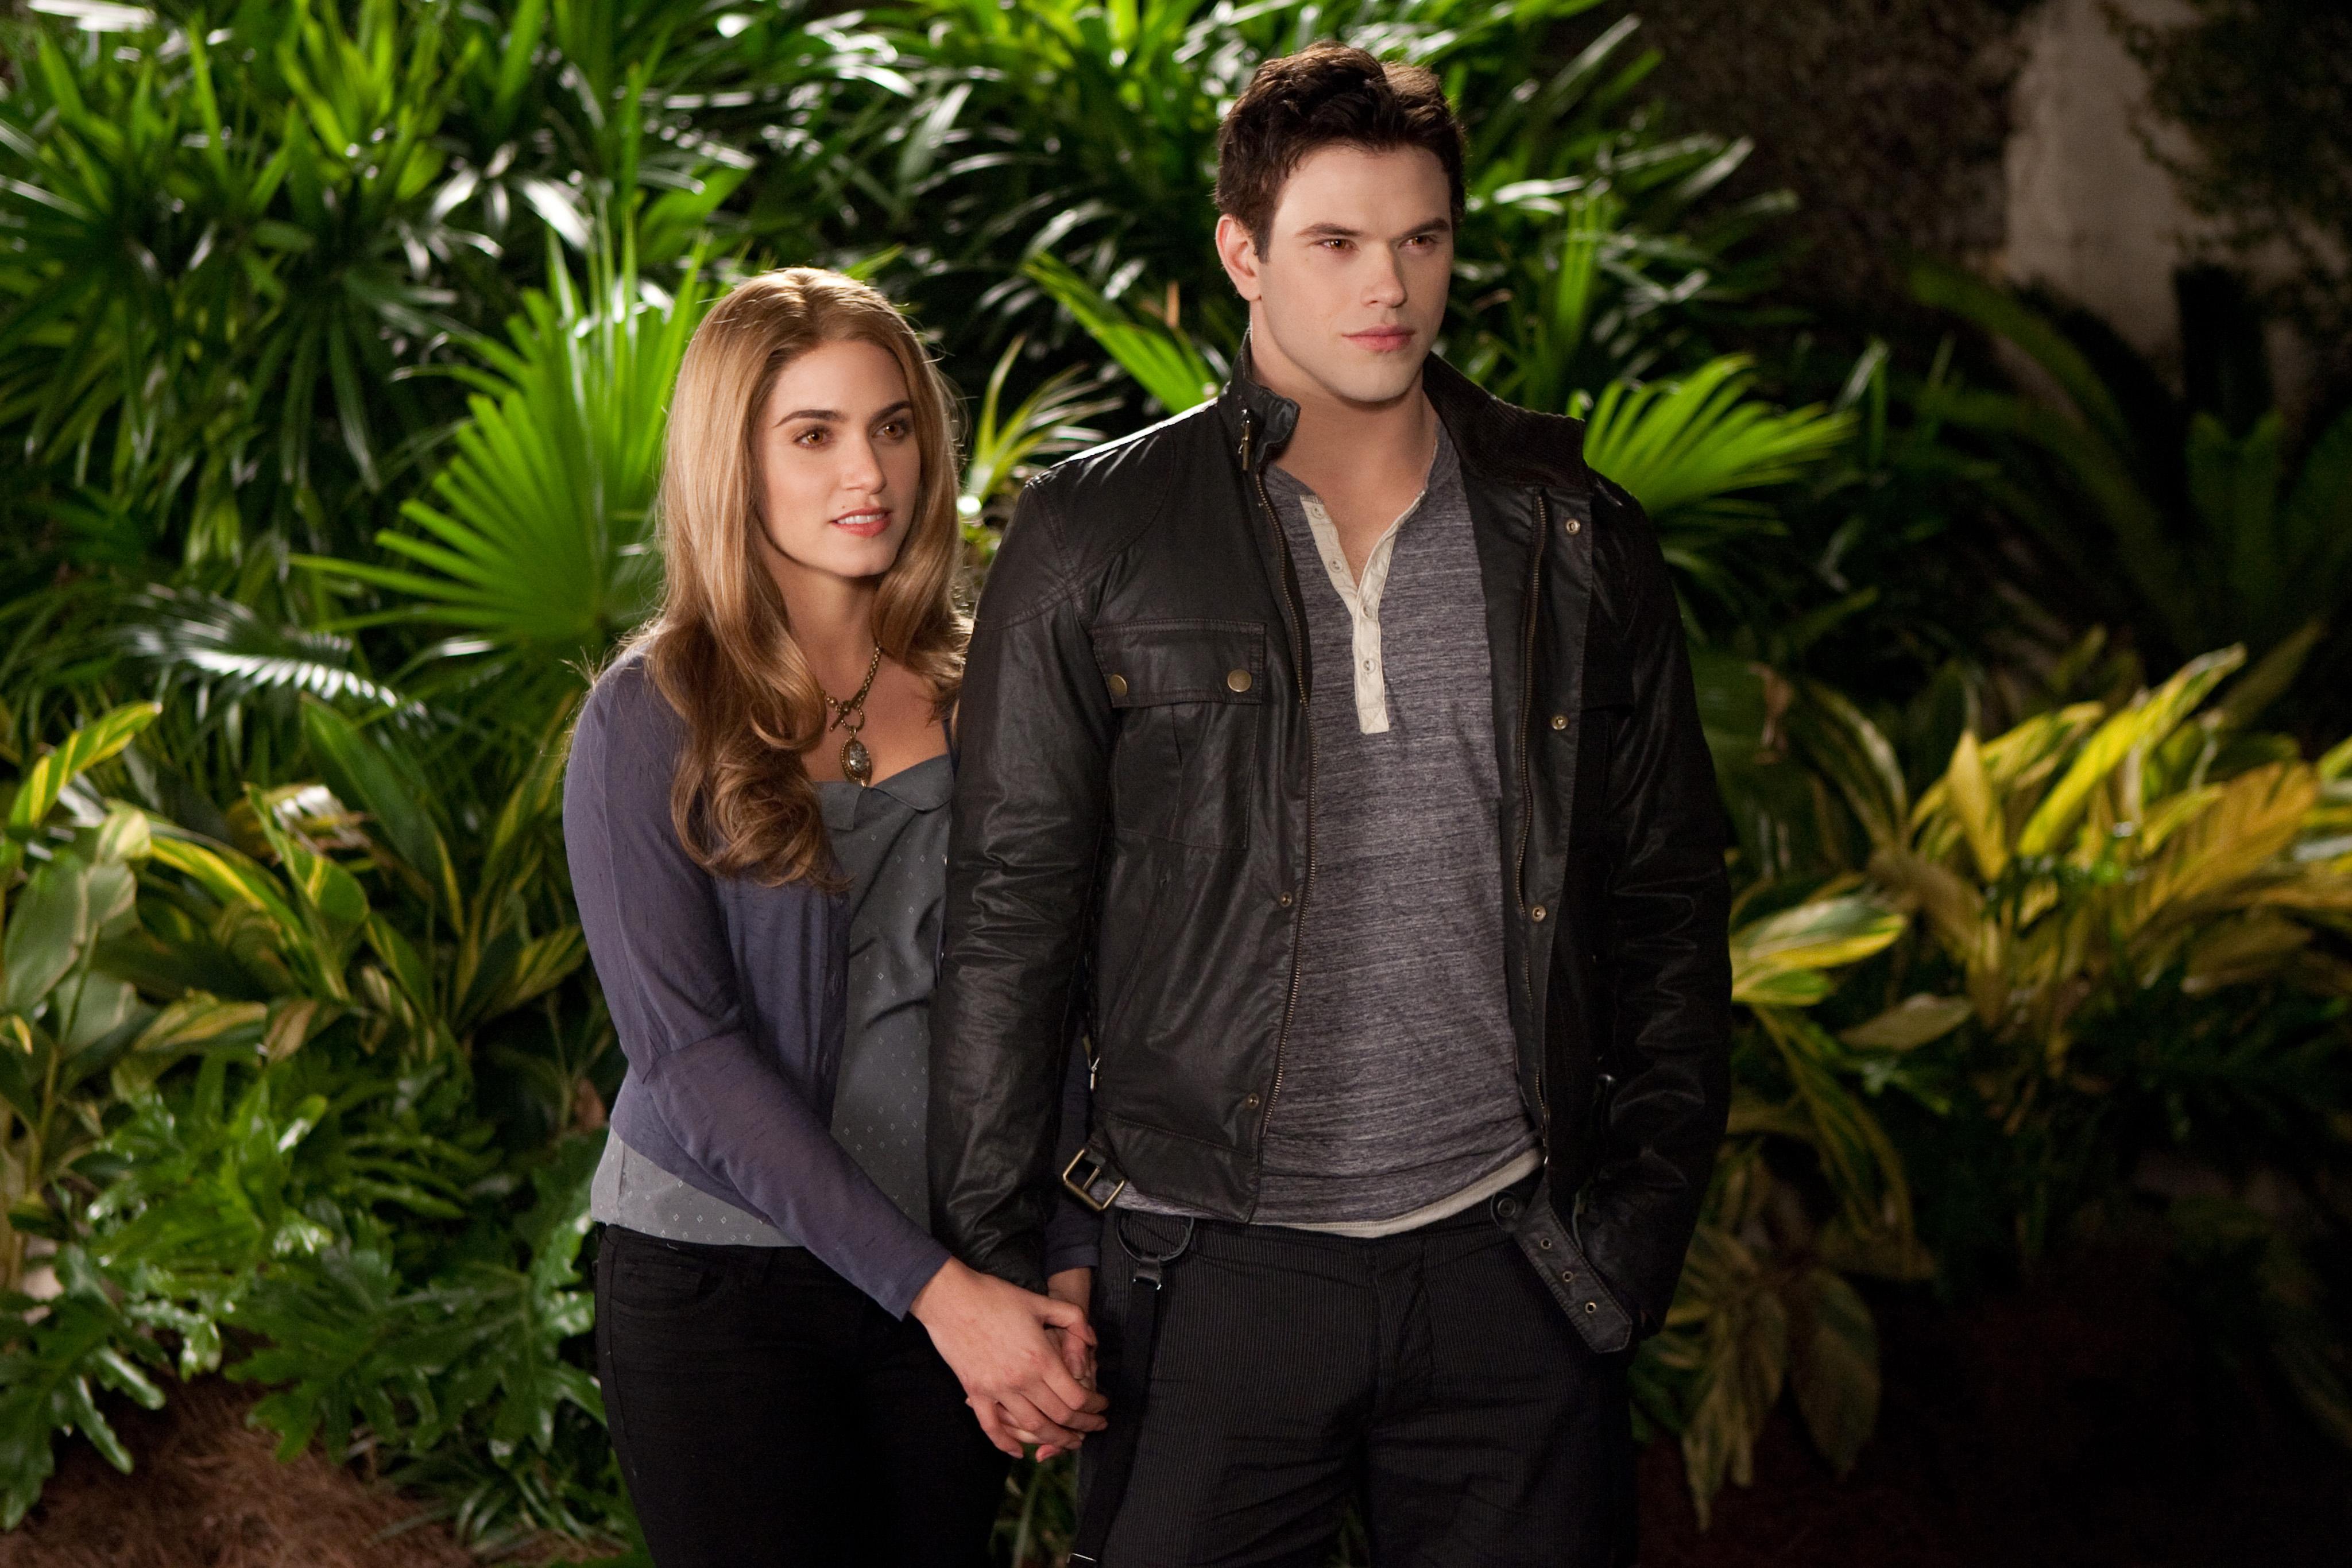 Emmett Cullen and Rosalie Hale | Twilight Saga Wiki | FANDOM